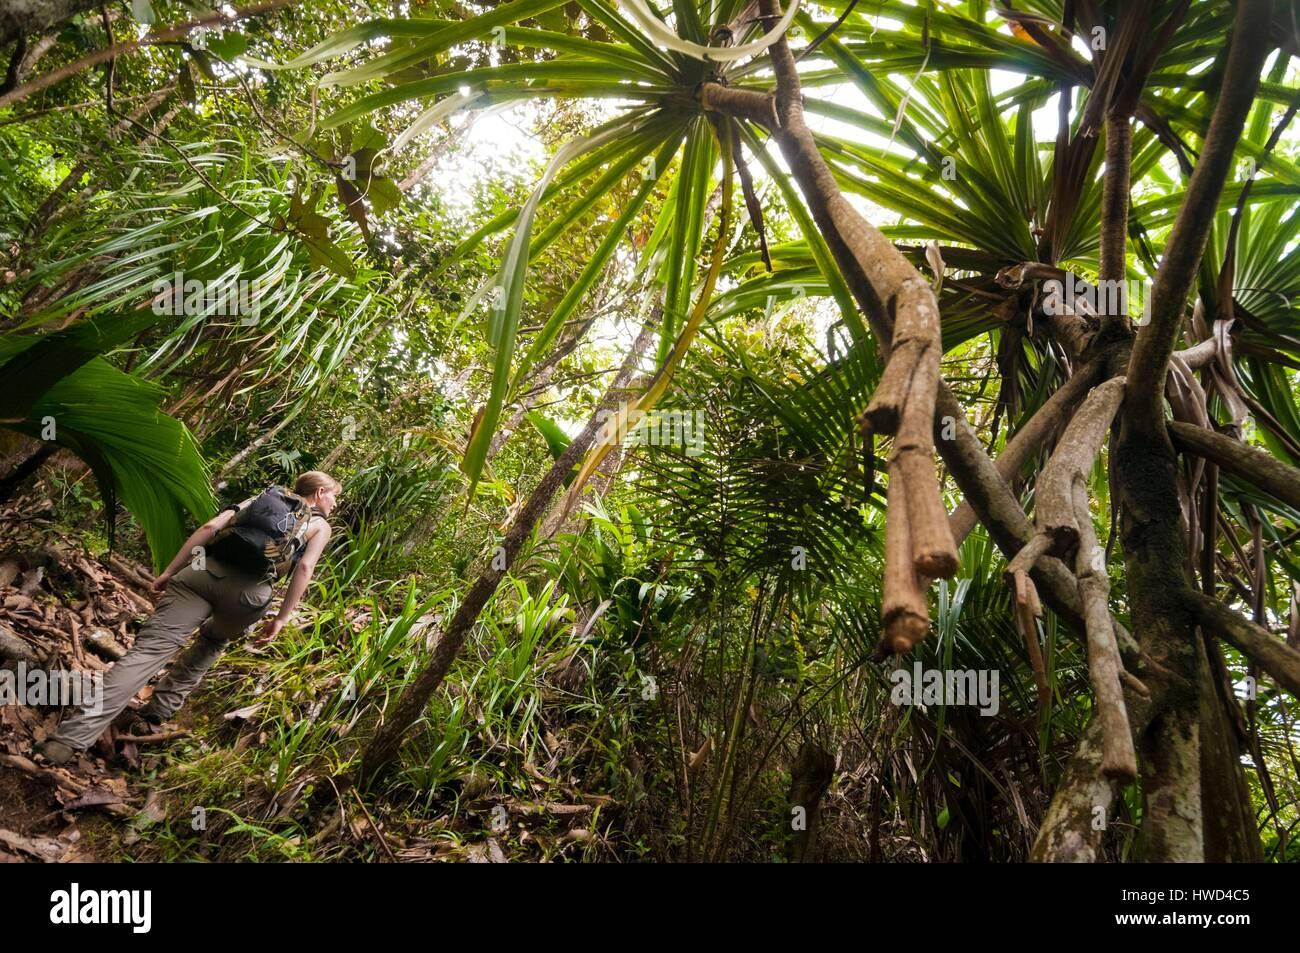 Seychelles, Mahe island, the Morne Seychellois National Park, hiking Copolia under the vacoas, MR yes - Stock Image